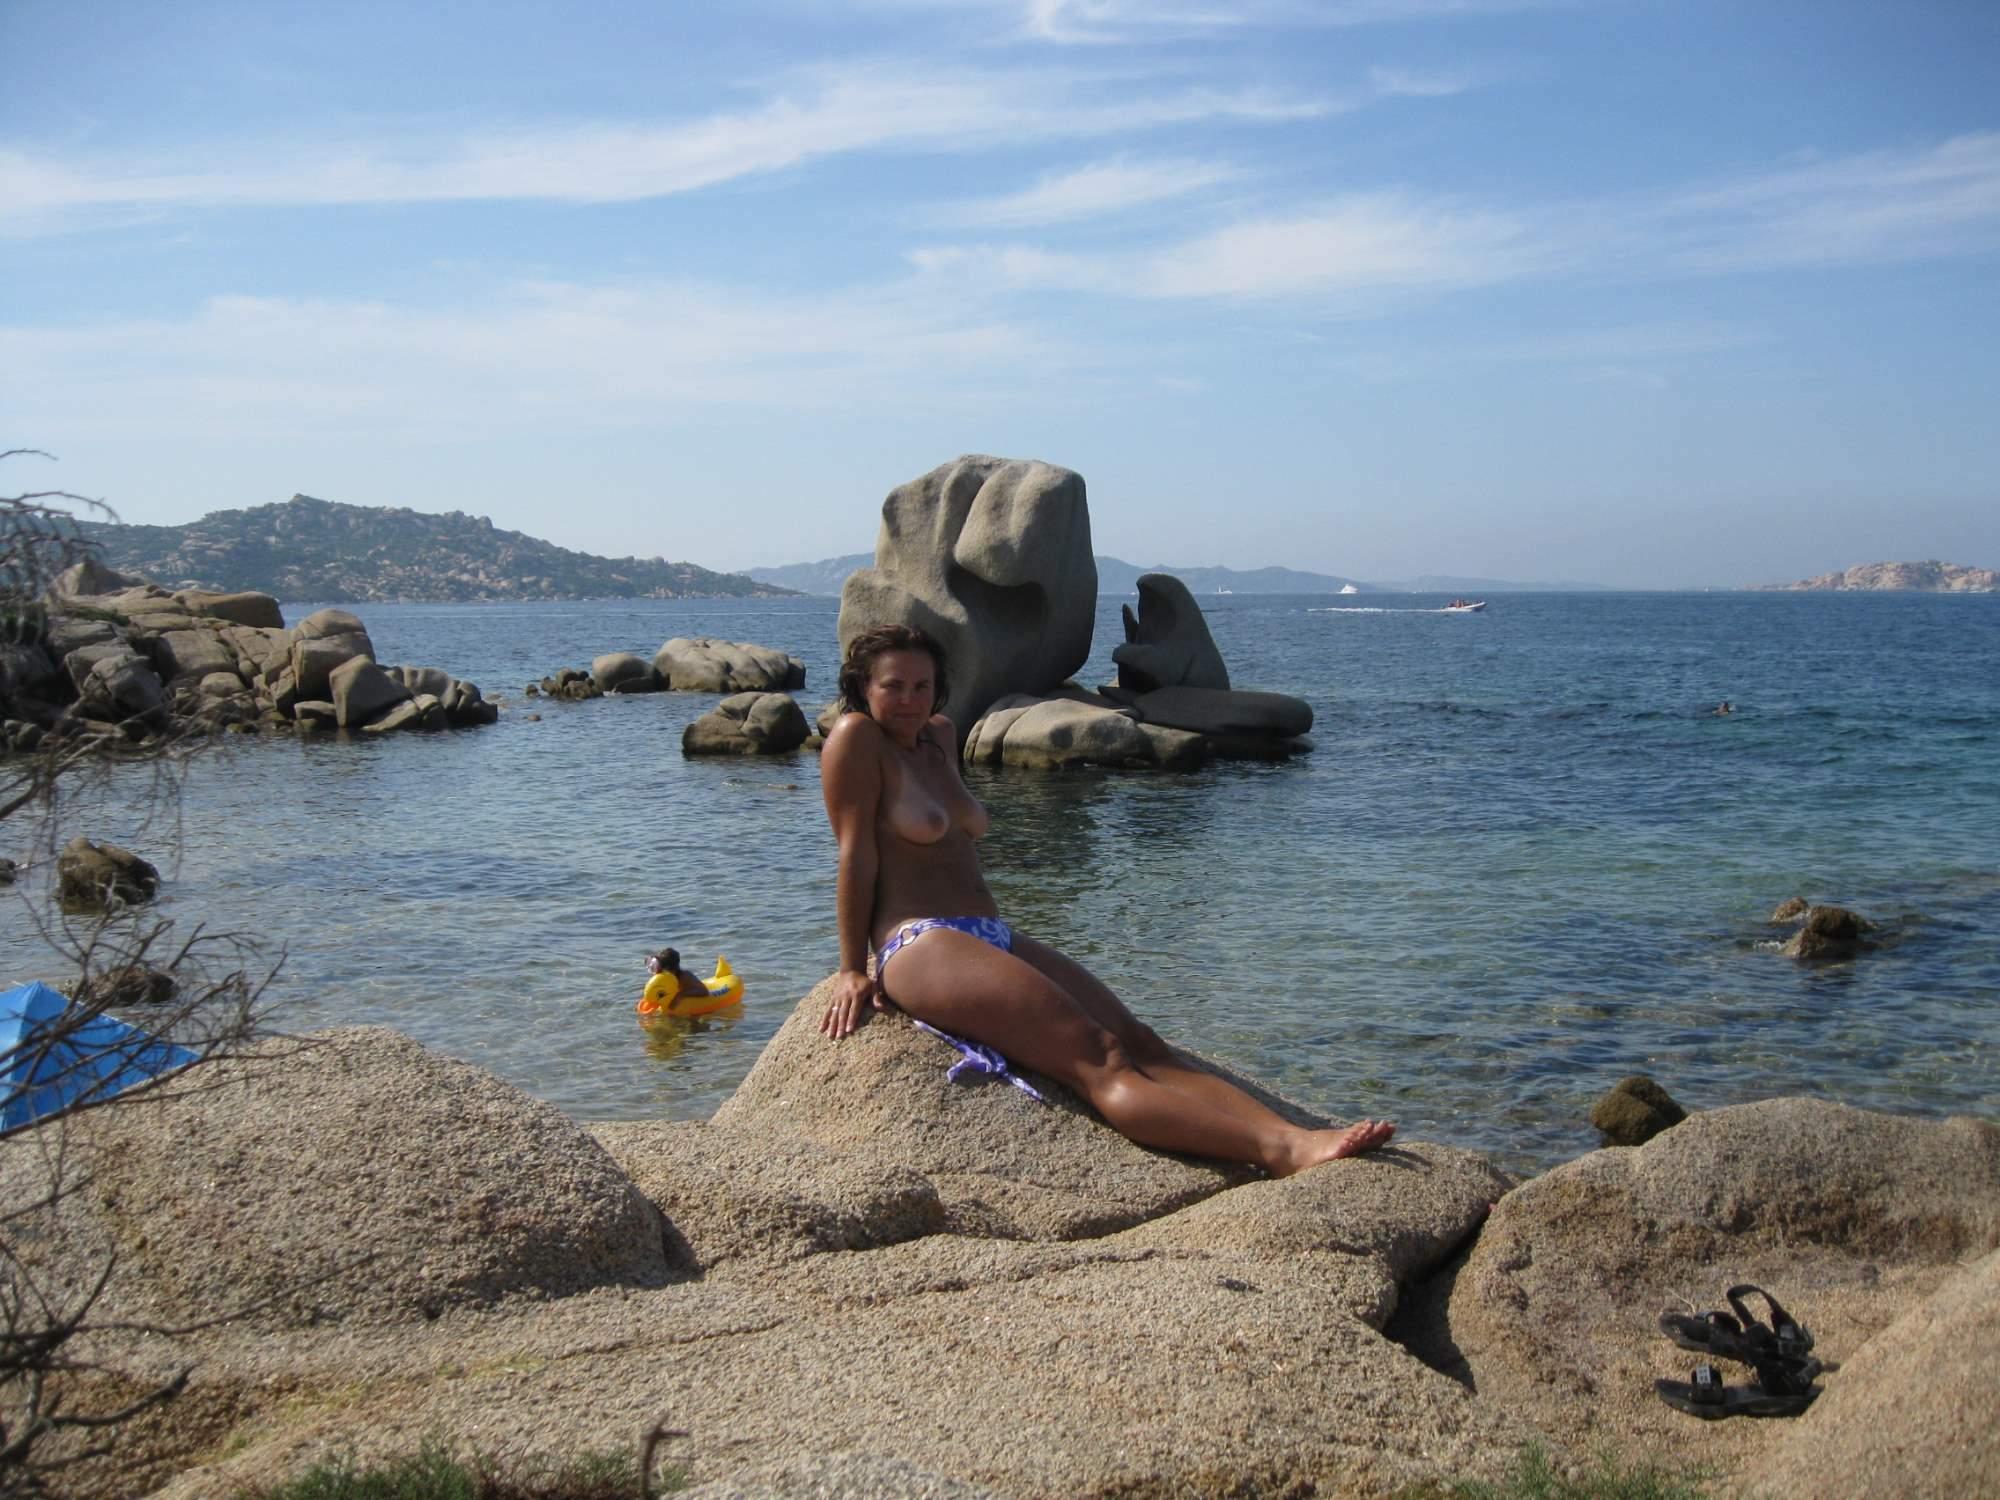 deti rajce granny nud and naked at a lake: http://img18.rajce .idnes.cz/d1802/11/11717/11717116_1cc70077edfe10a6c681d51268b386dd/images/IMG_4417.jpg